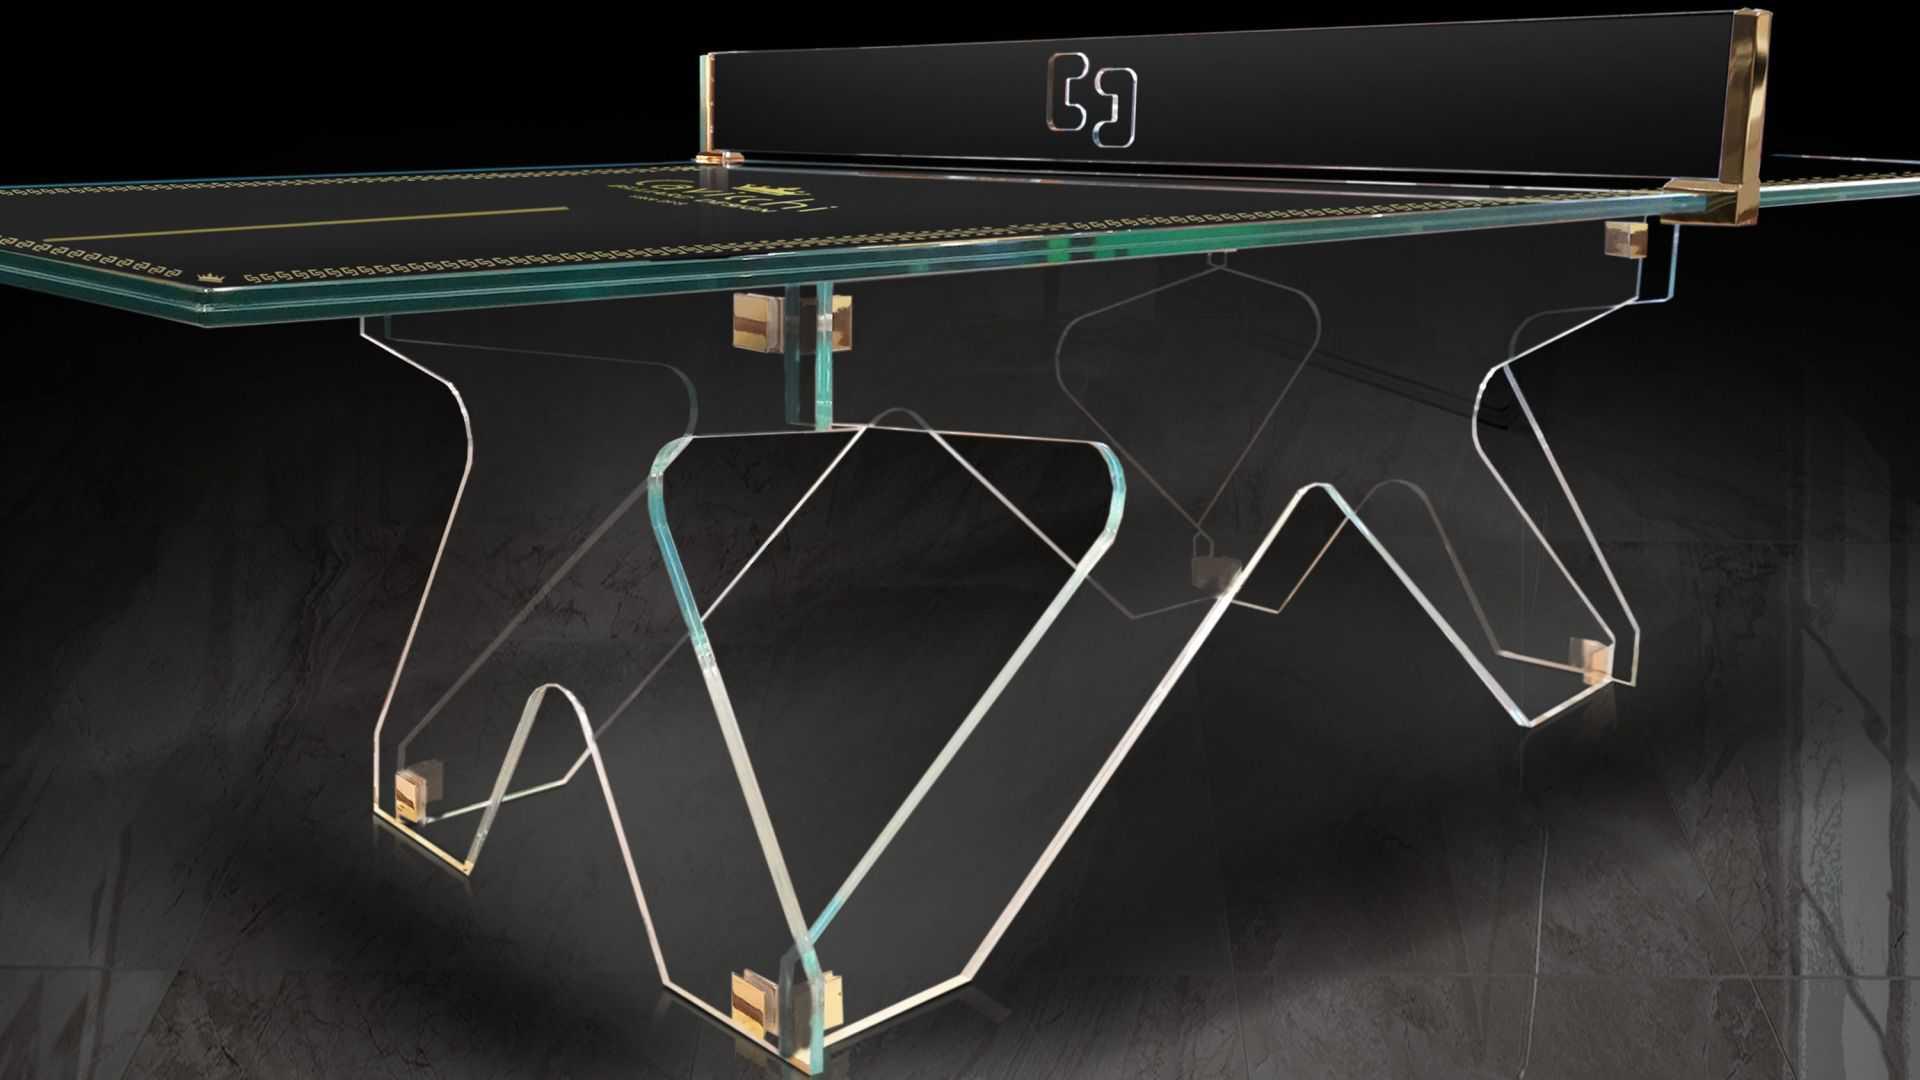 Crystal Ping Pong Table 4